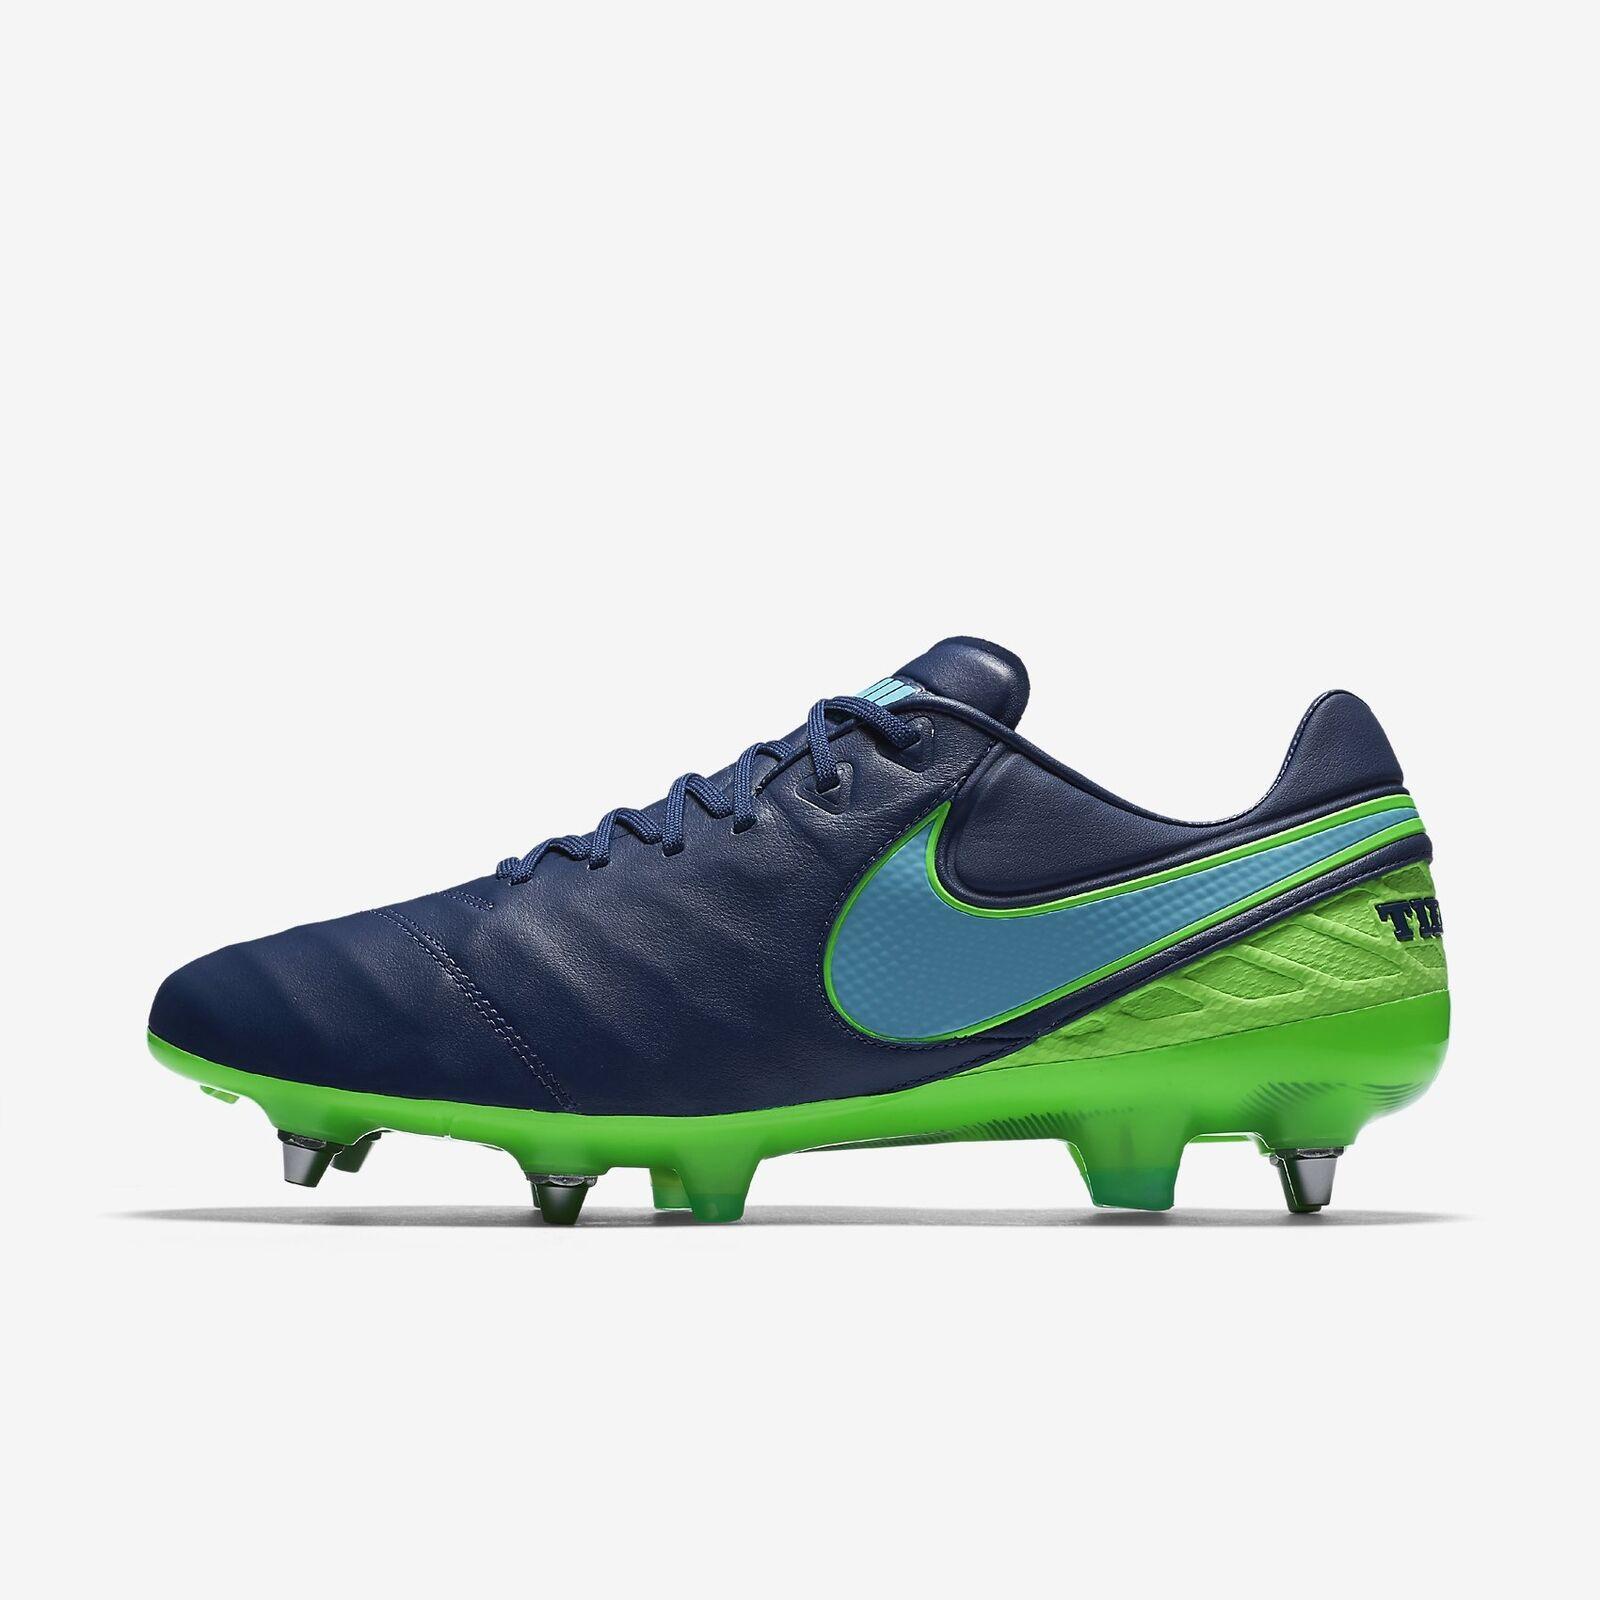 Men's Nike Tiempo Legend VI SG-PRO Soccer Cleats Blue Green Comfortable Cheap and beautiful fashion